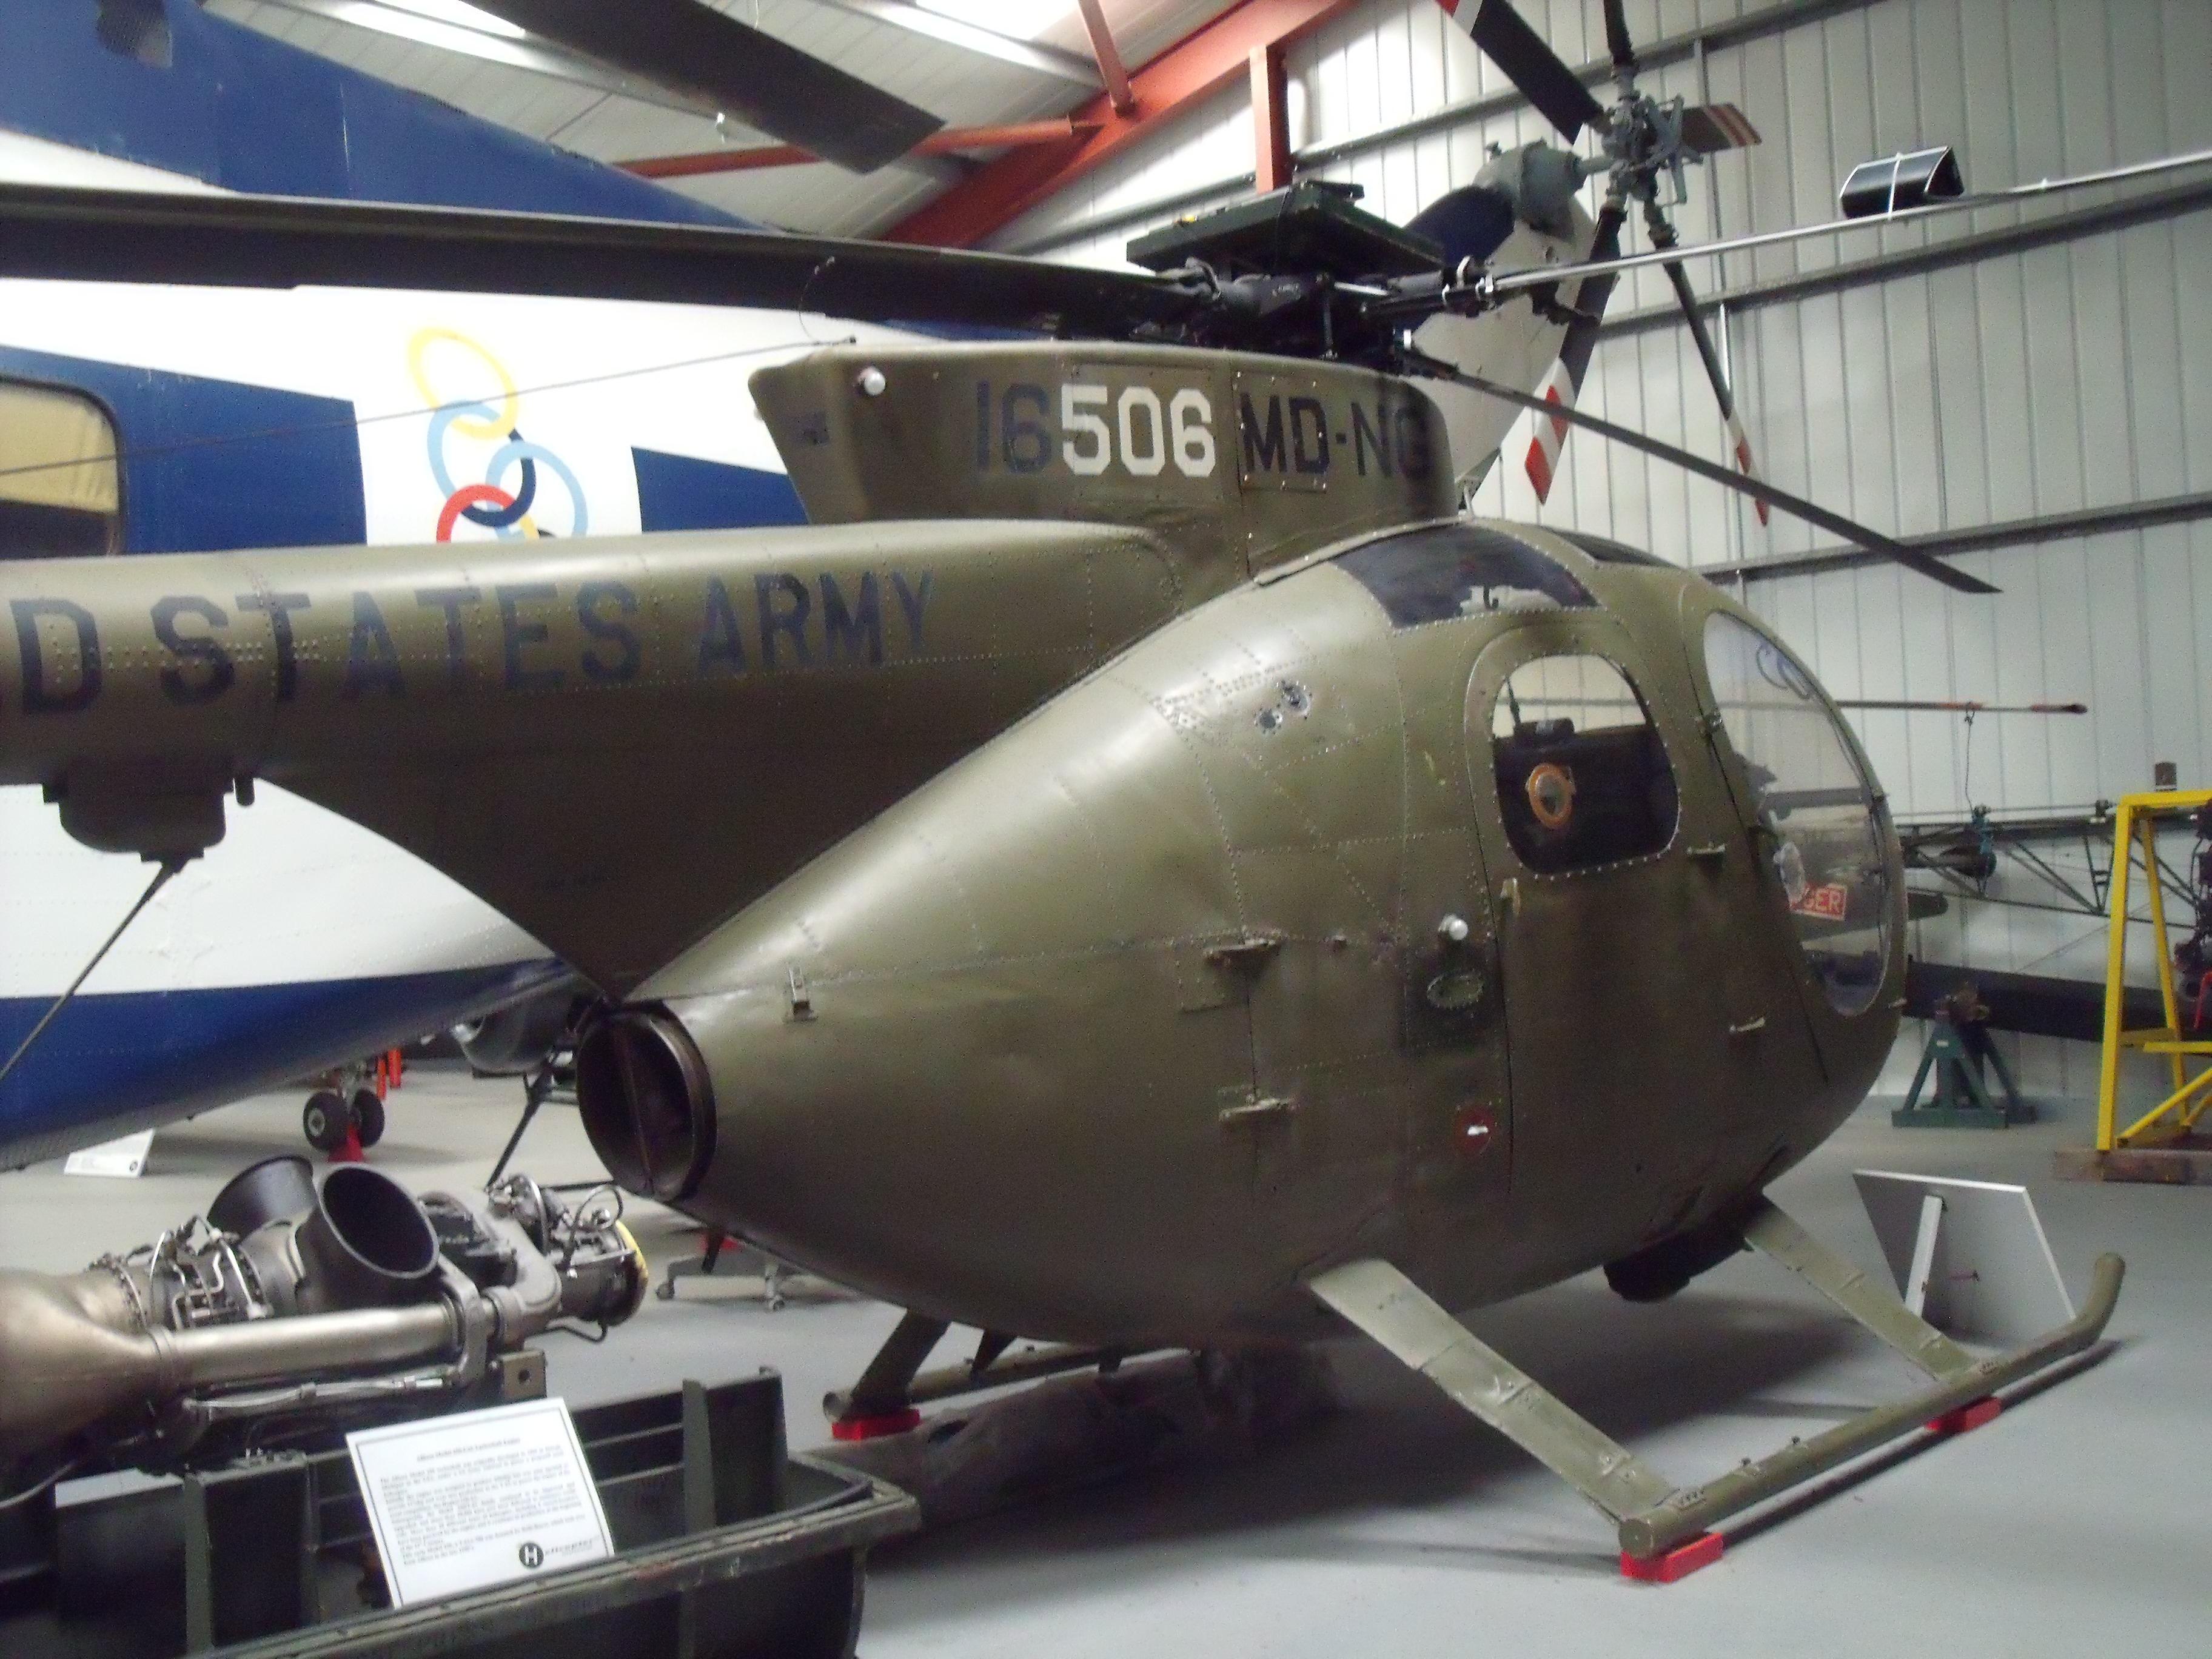 File:67-16506 Hughes OH-6A Cayuse (369A) (cn 0891